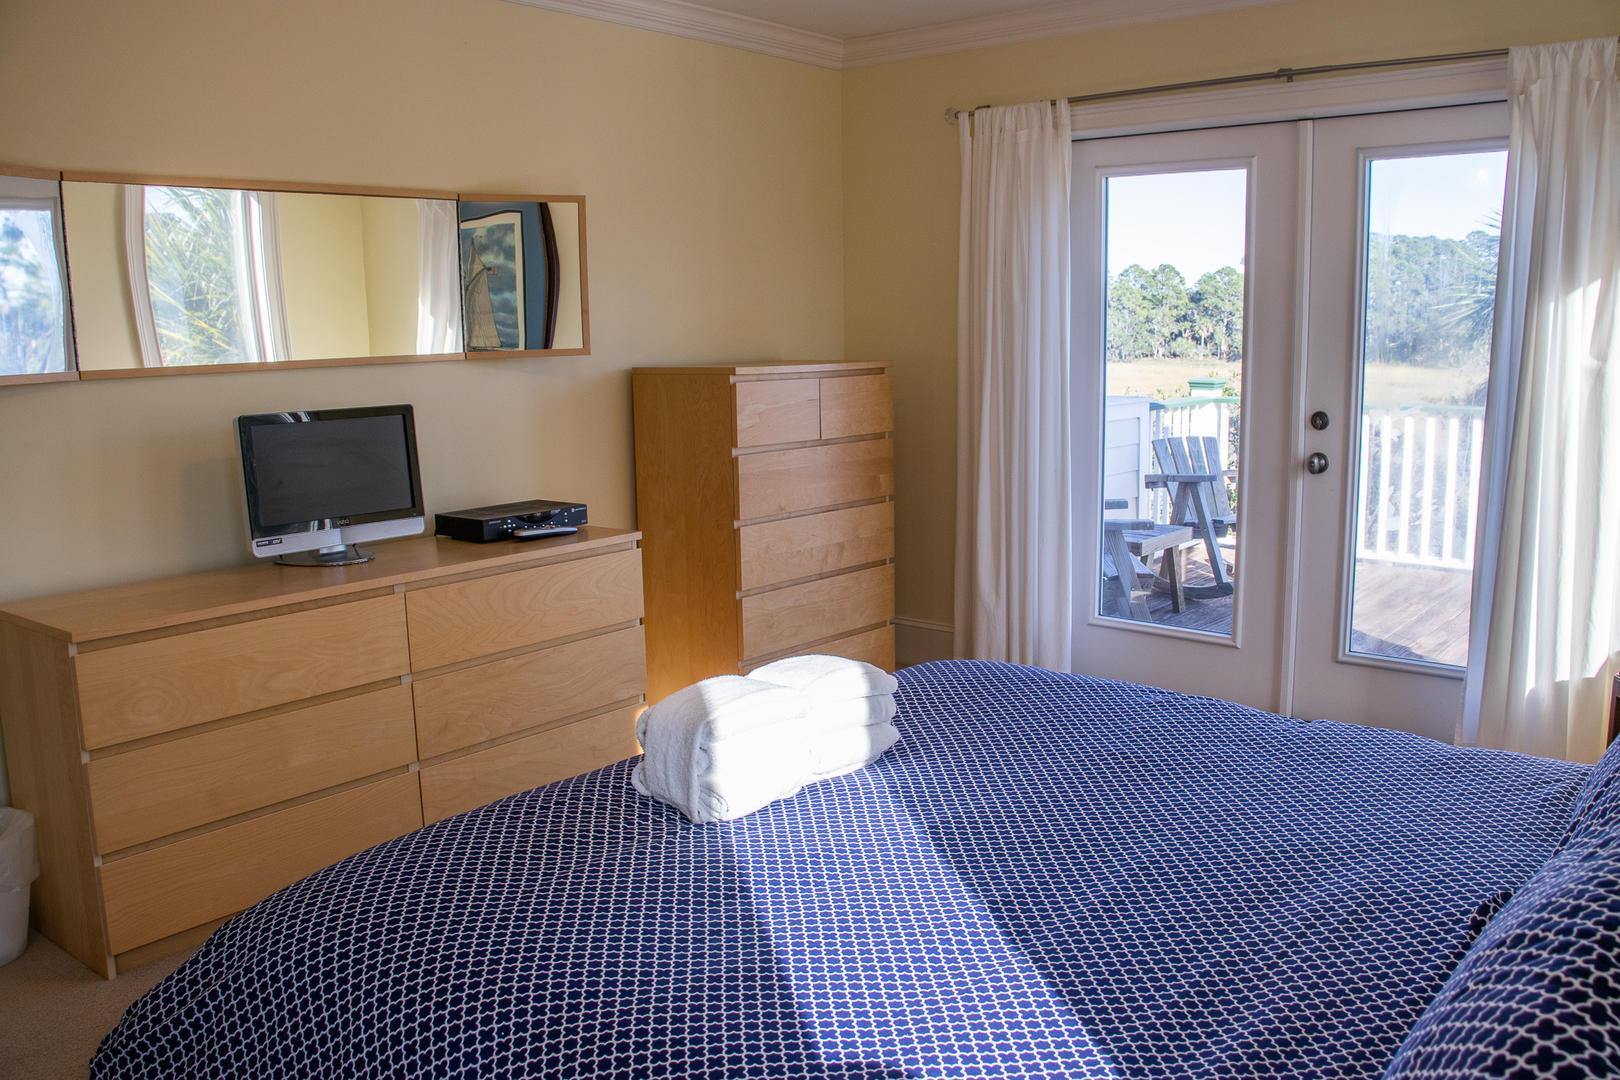 Master, 2nd floor, TV w/ DVD player, upper deck access, en suite full bath